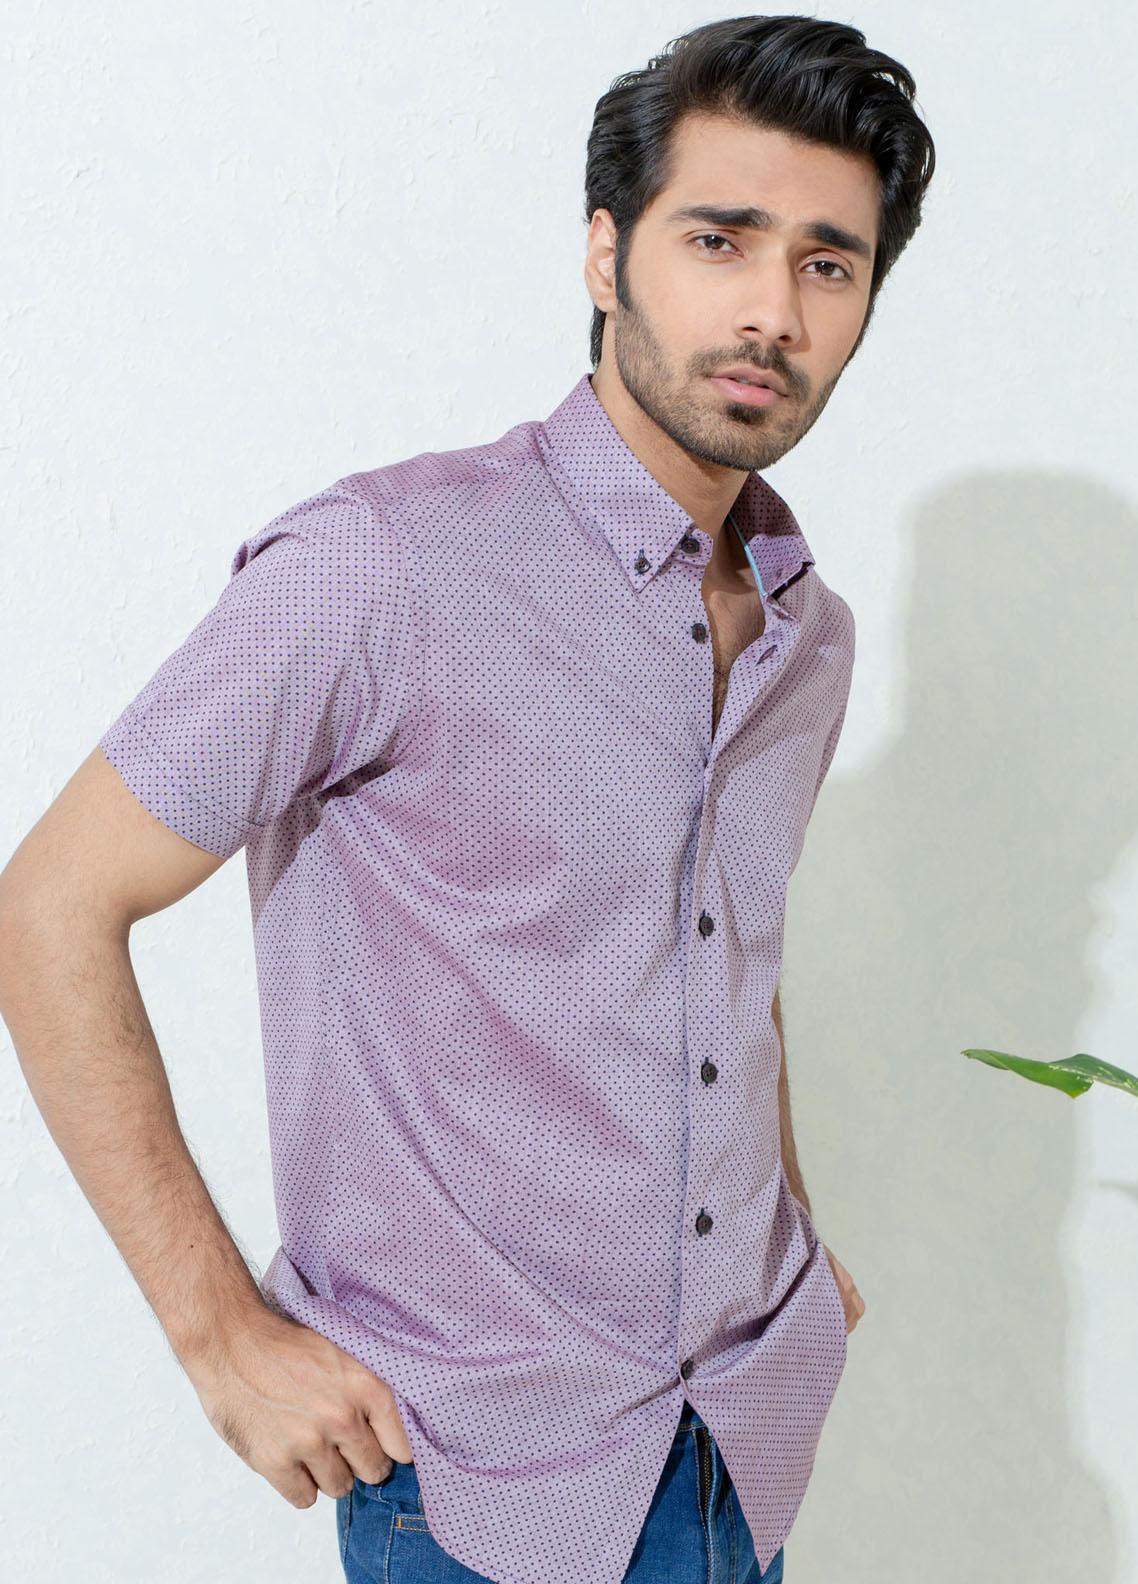 Brumano Cotton Casual Shirts for Men -  Purple Polka Dot Half Sleeve